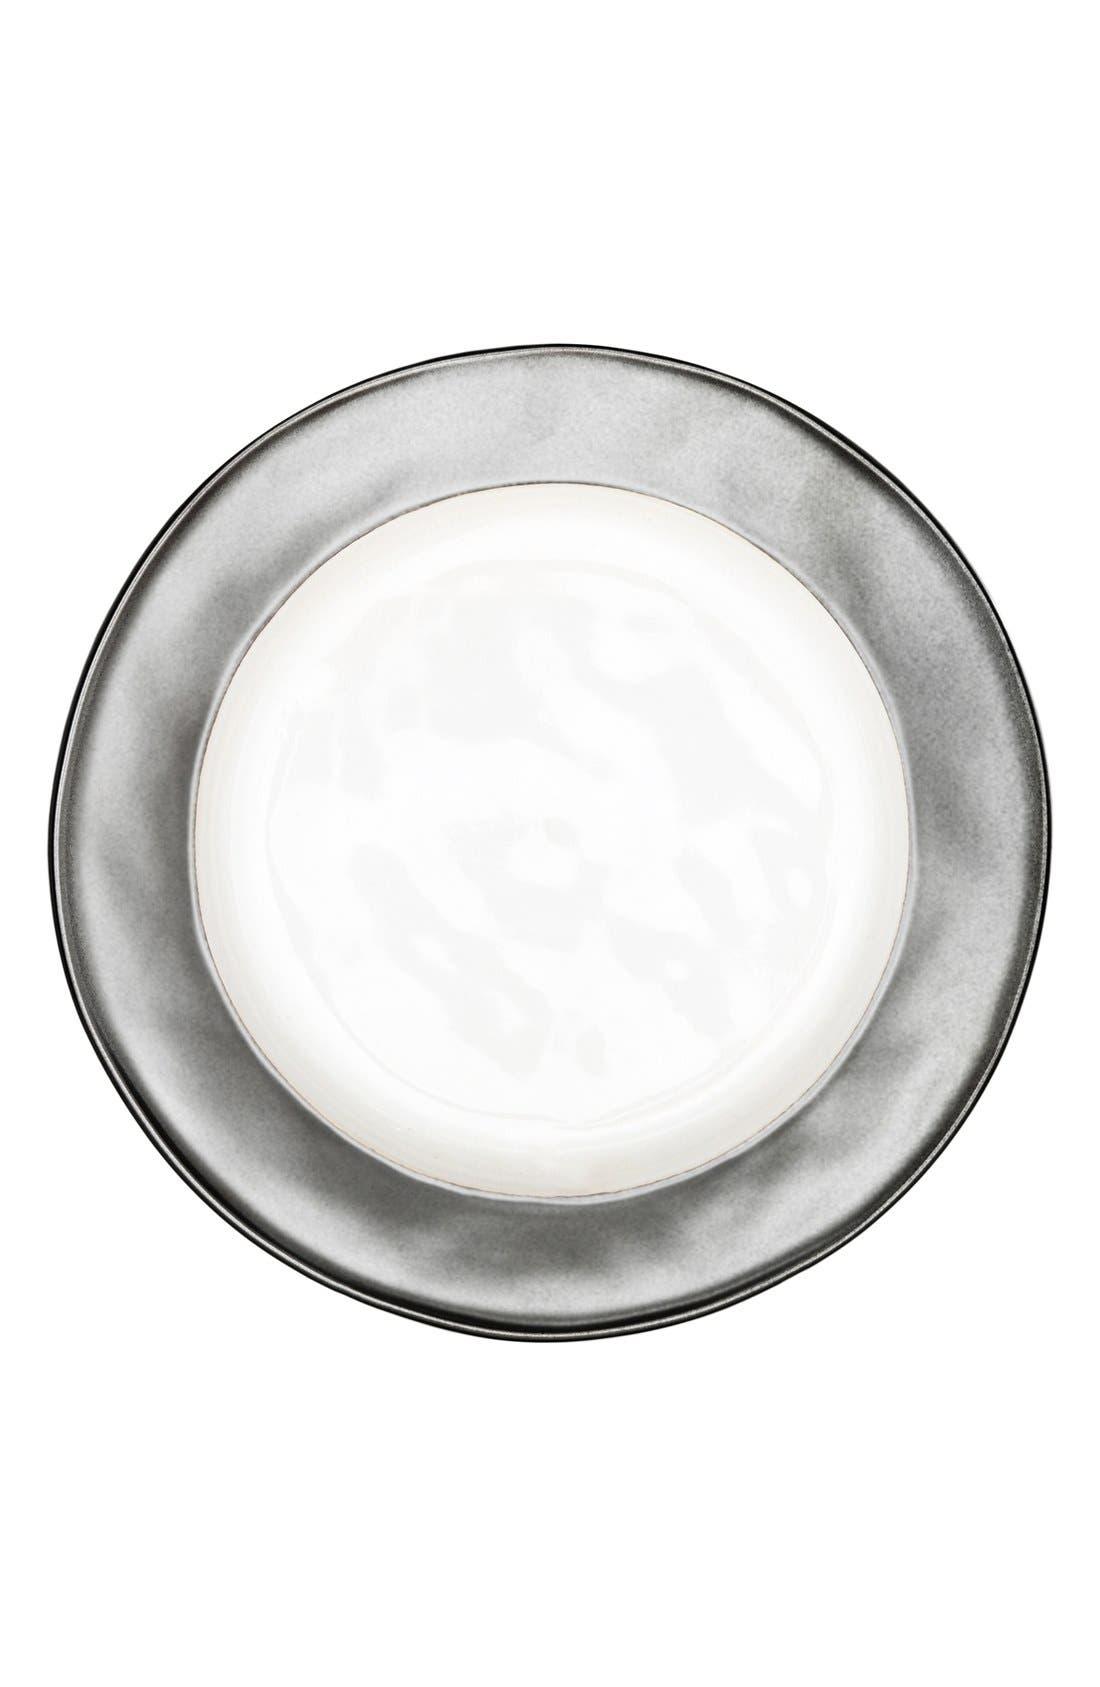 Alternate Image 1 Selected - Juliska'Emerson' Ceramic Dessert Plate